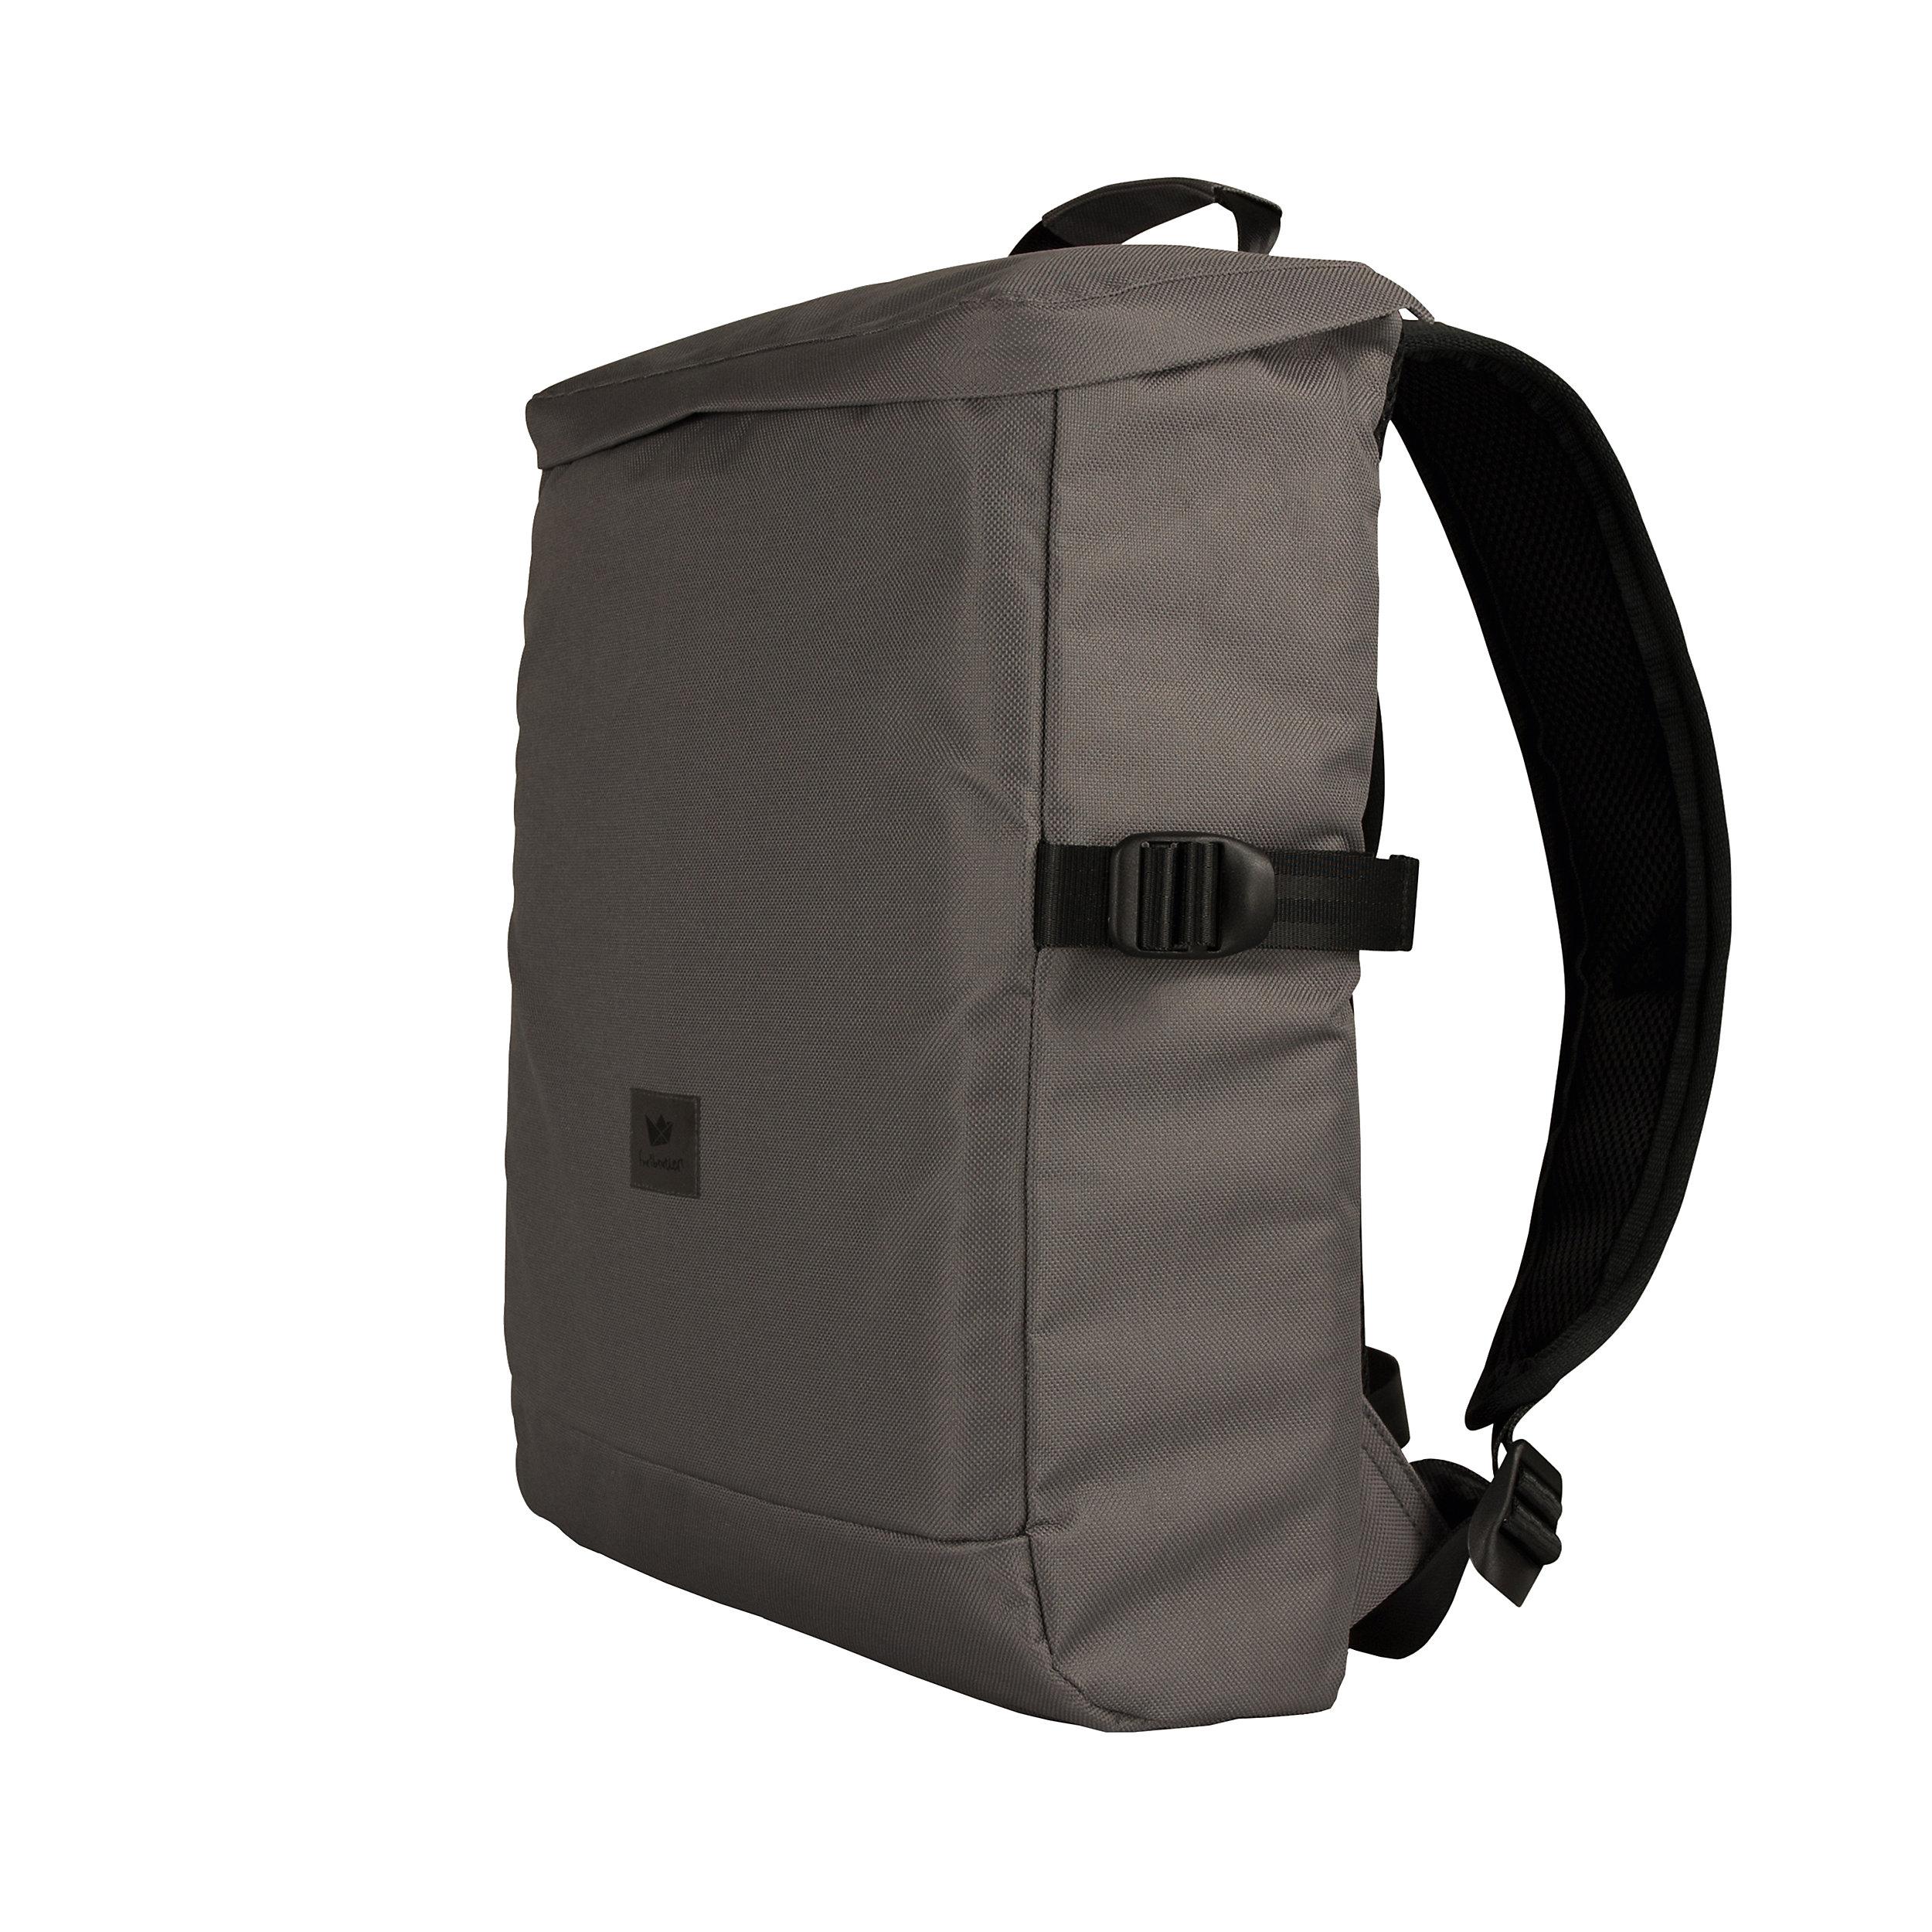 "Backpack Aris 15"" S 14 Liter"